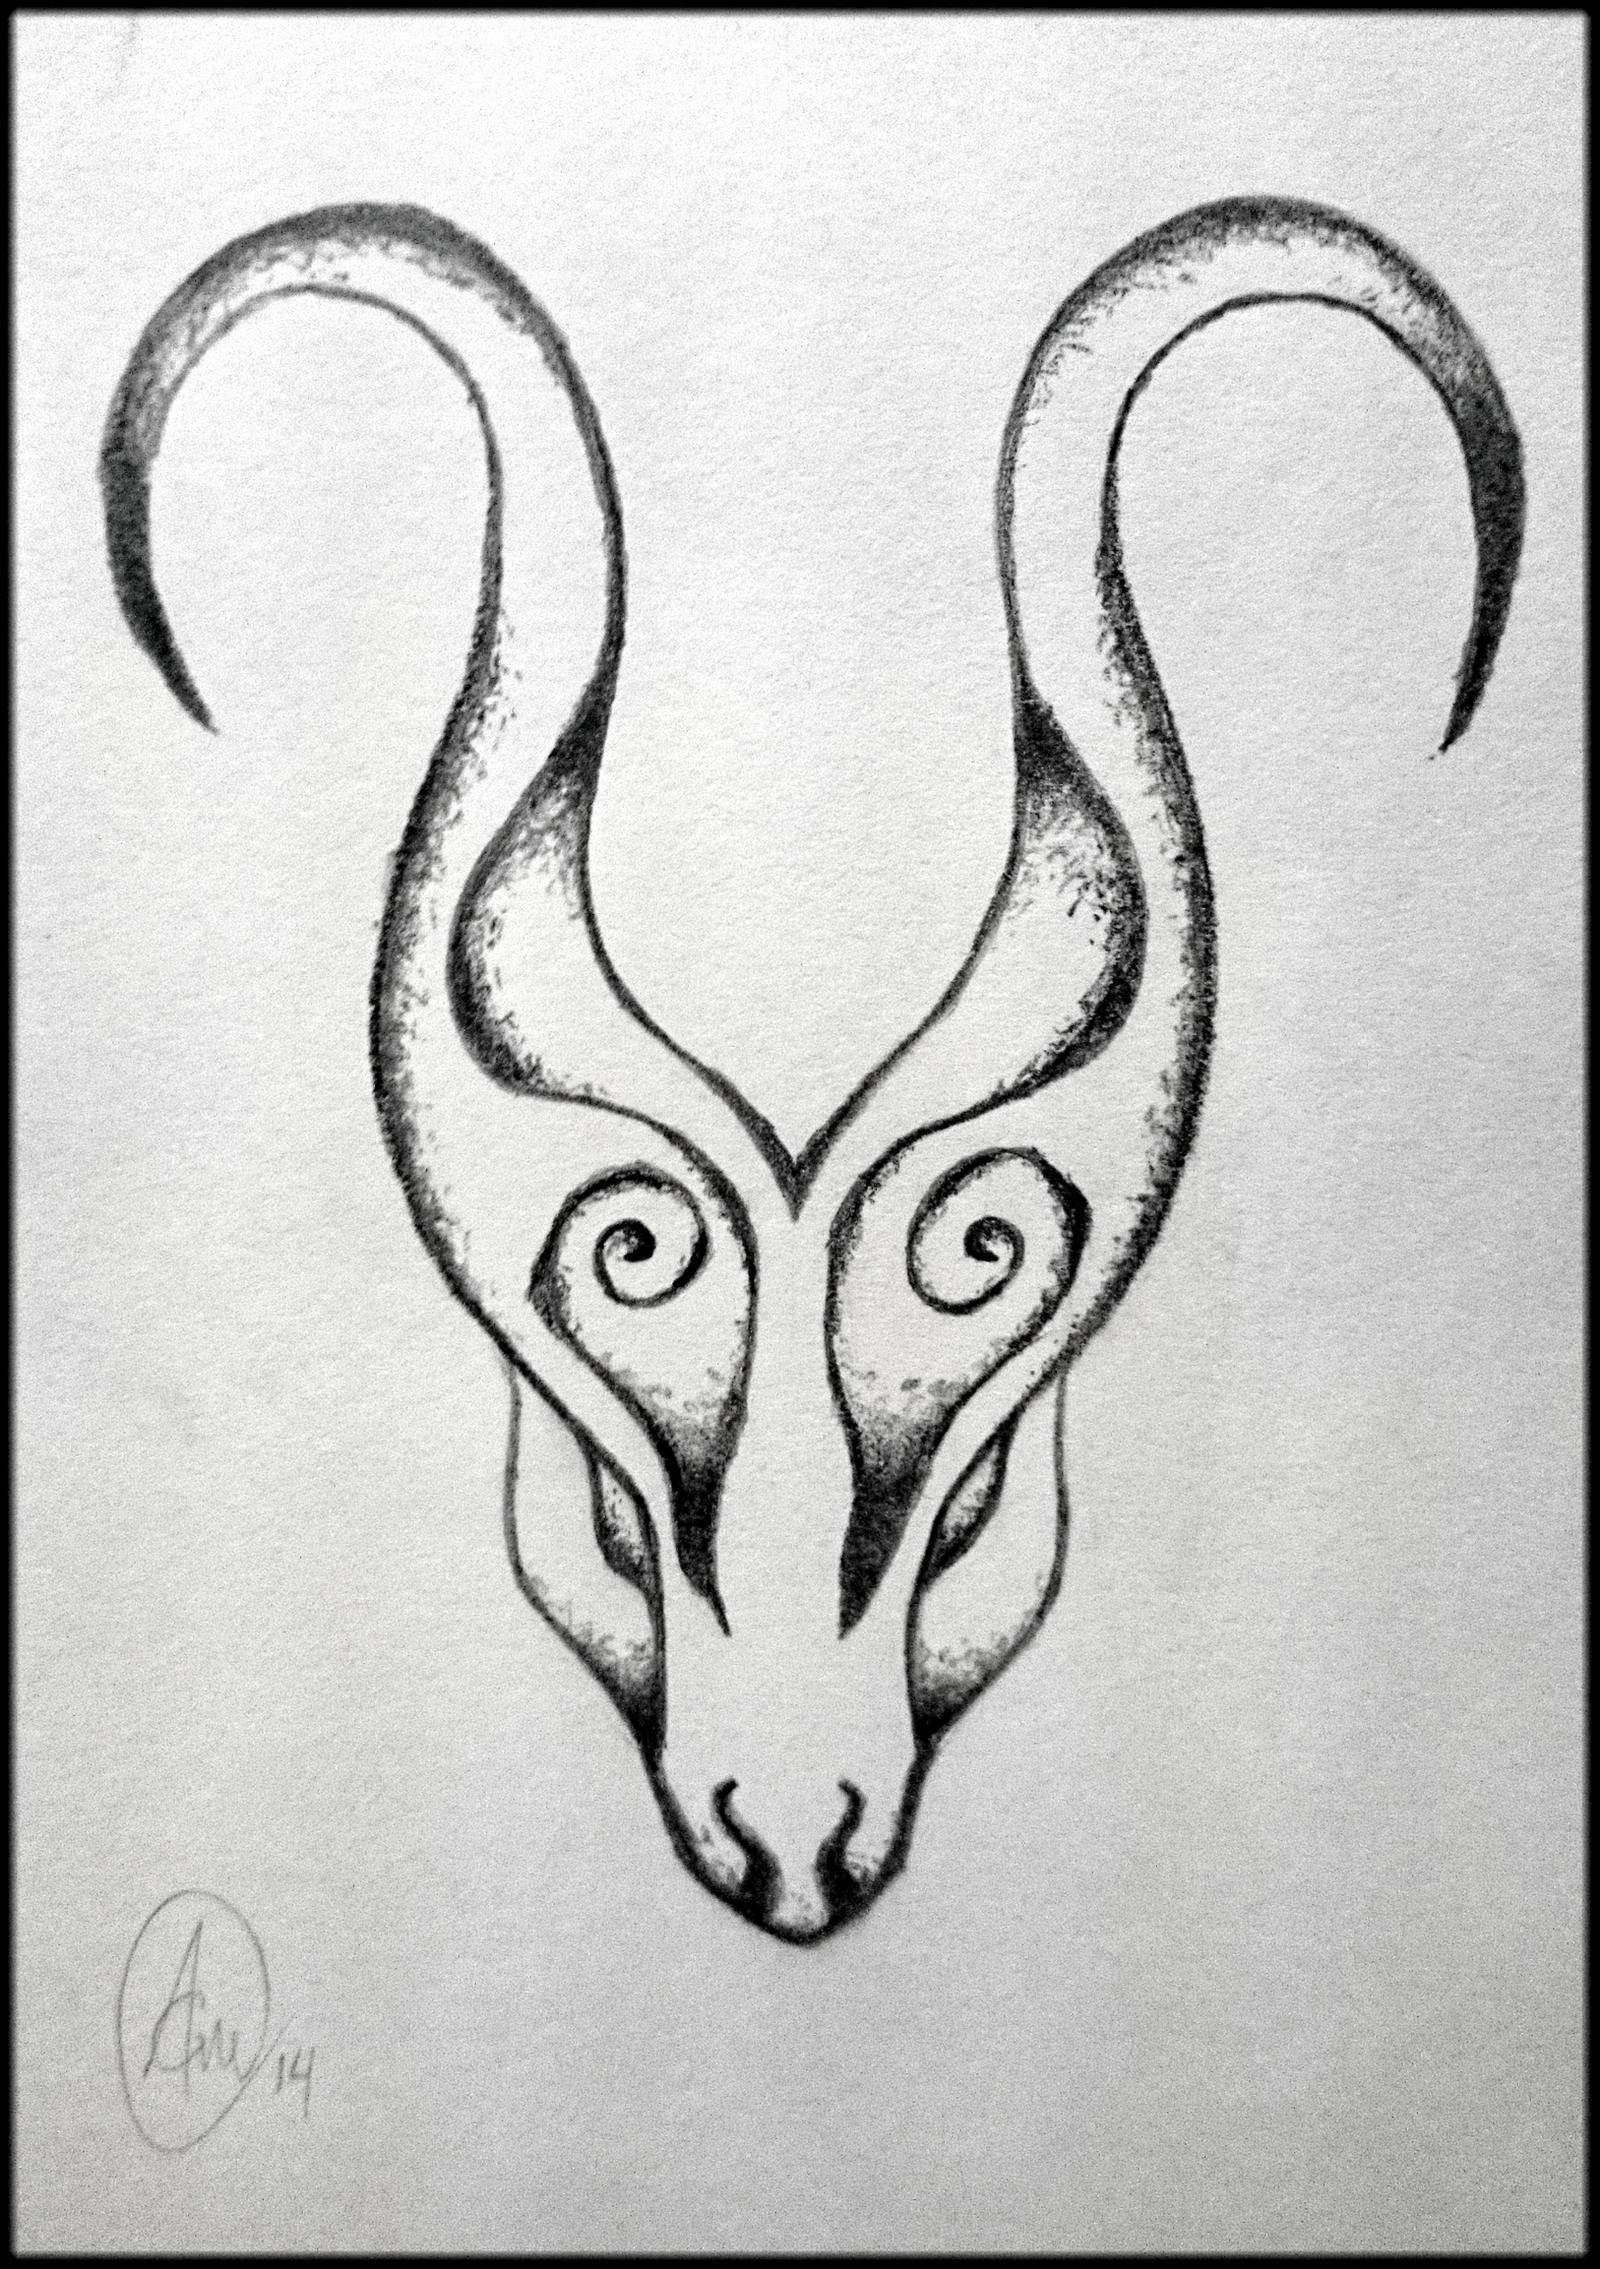 Aries Tattoo Drawing 1 by BlazeDev86 on DeviantArt